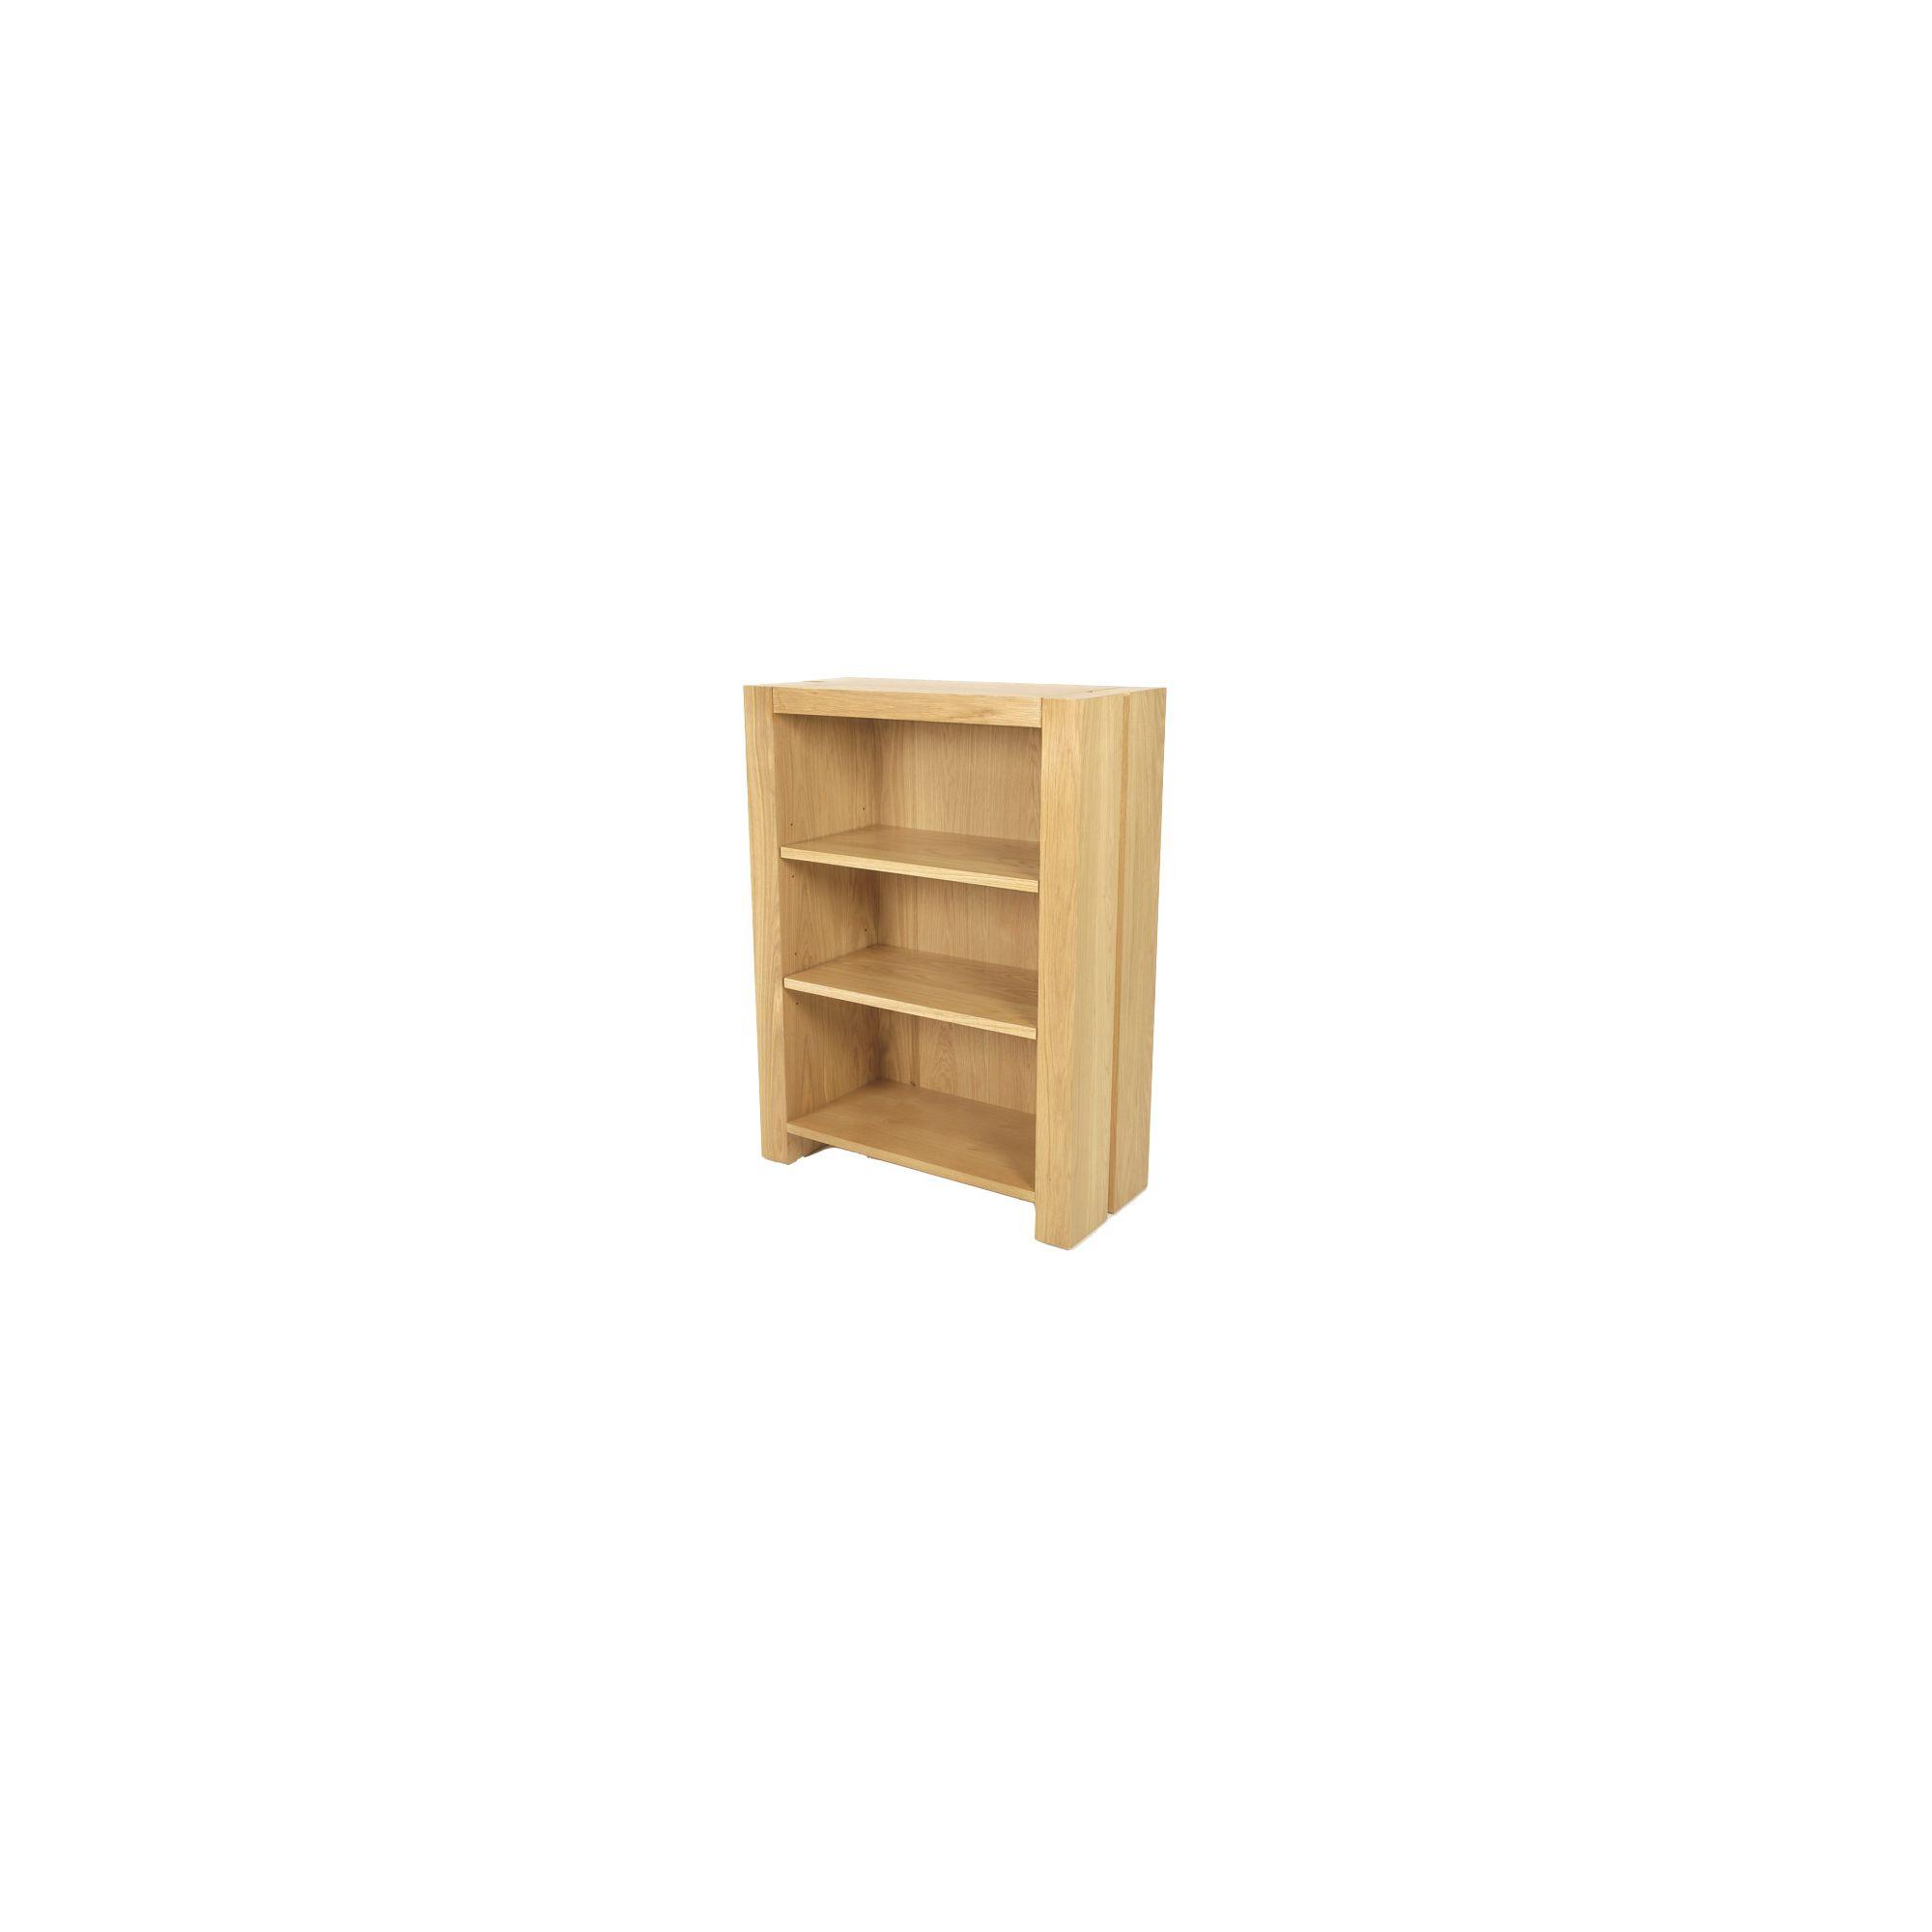 Elements Eton Oak Low Bookcase at Tesco Direct